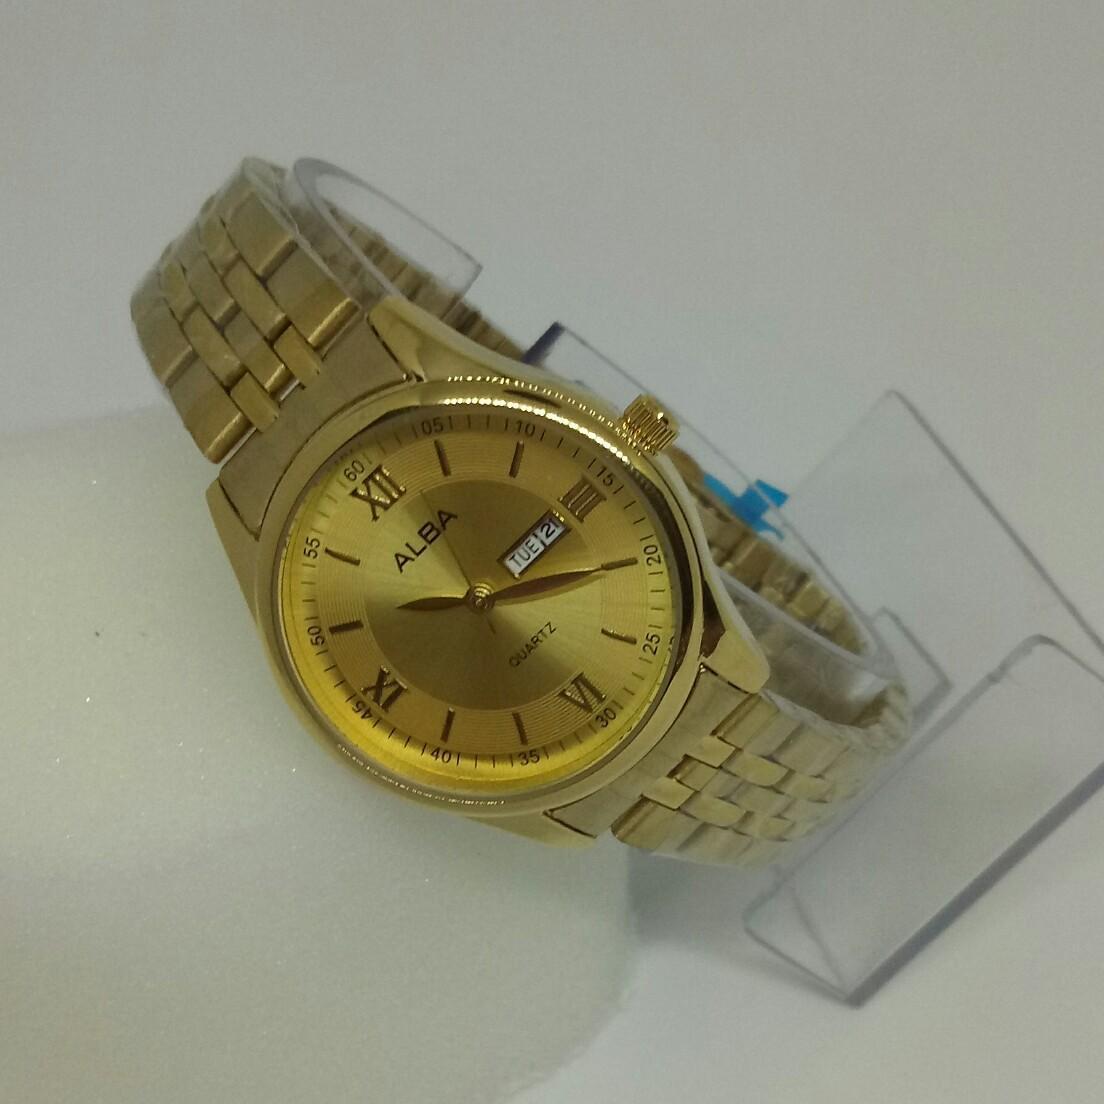 ALBA Jam Tangan Wanita-jam tangan wanita fashion - date on - rantai